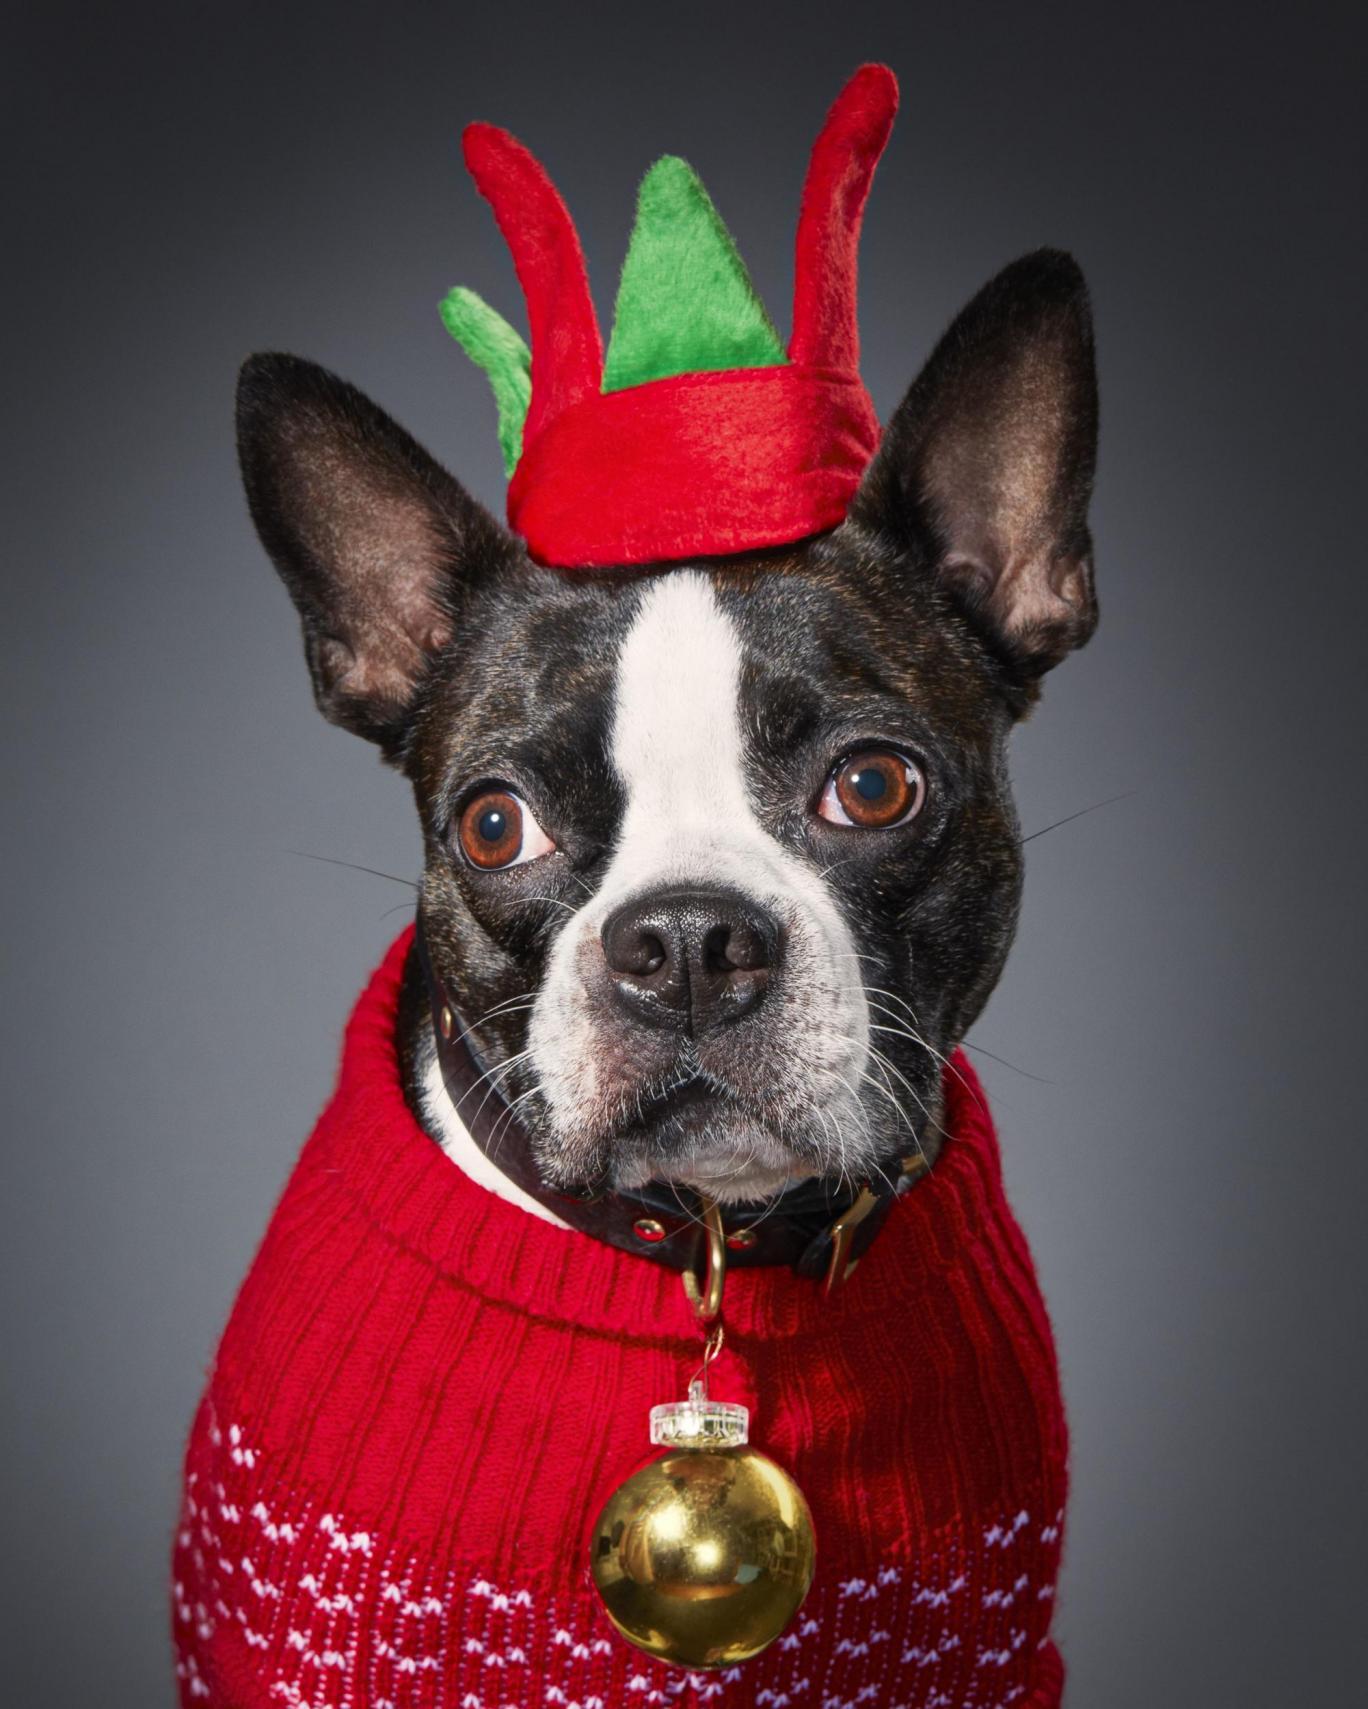 Ru the Boston Terrier